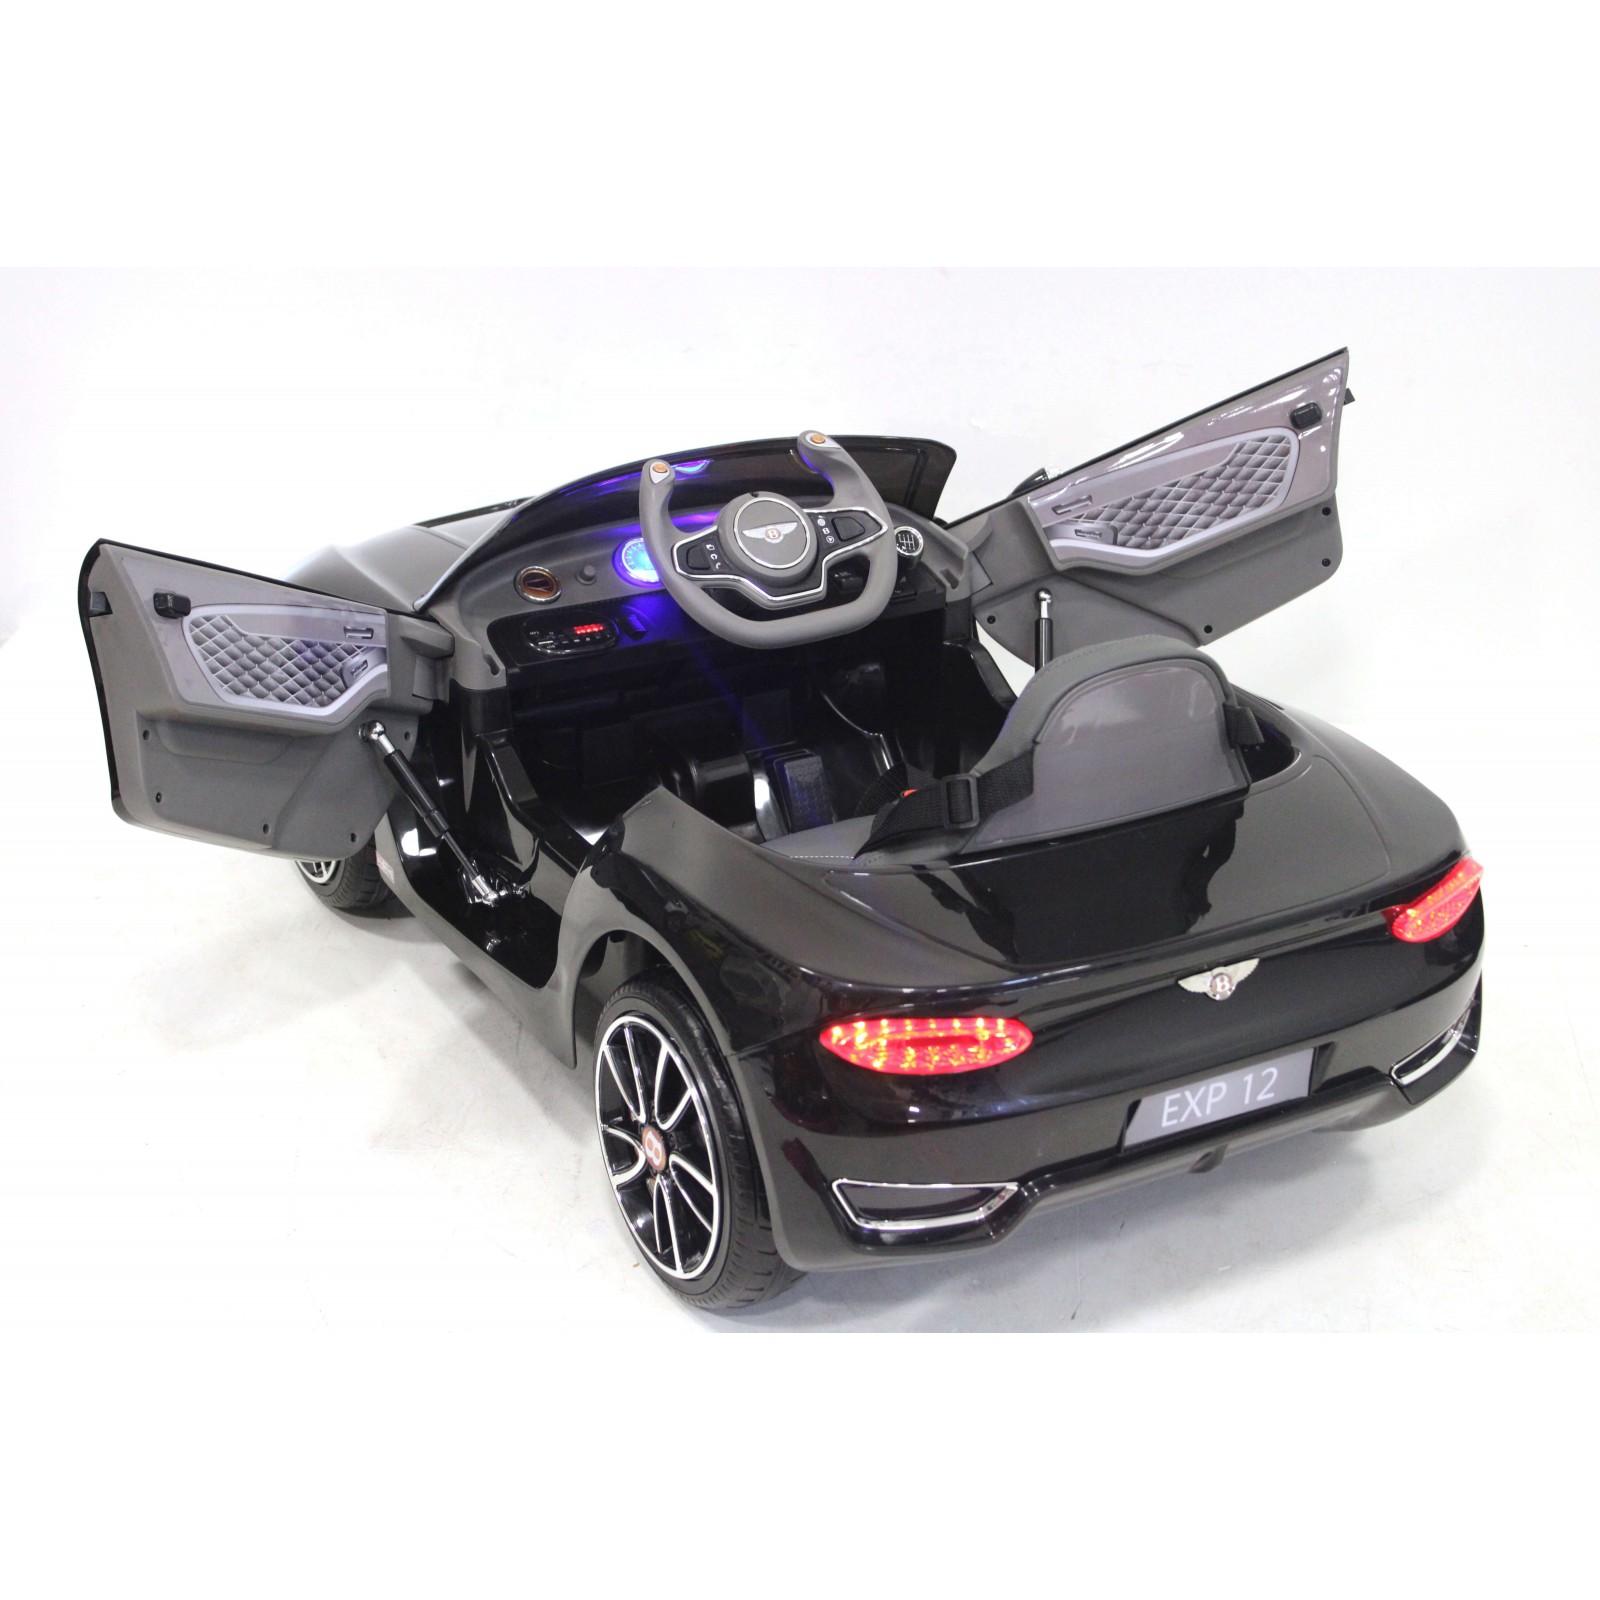 Детский электромобиль Bentley-EXP12  (JE1166)